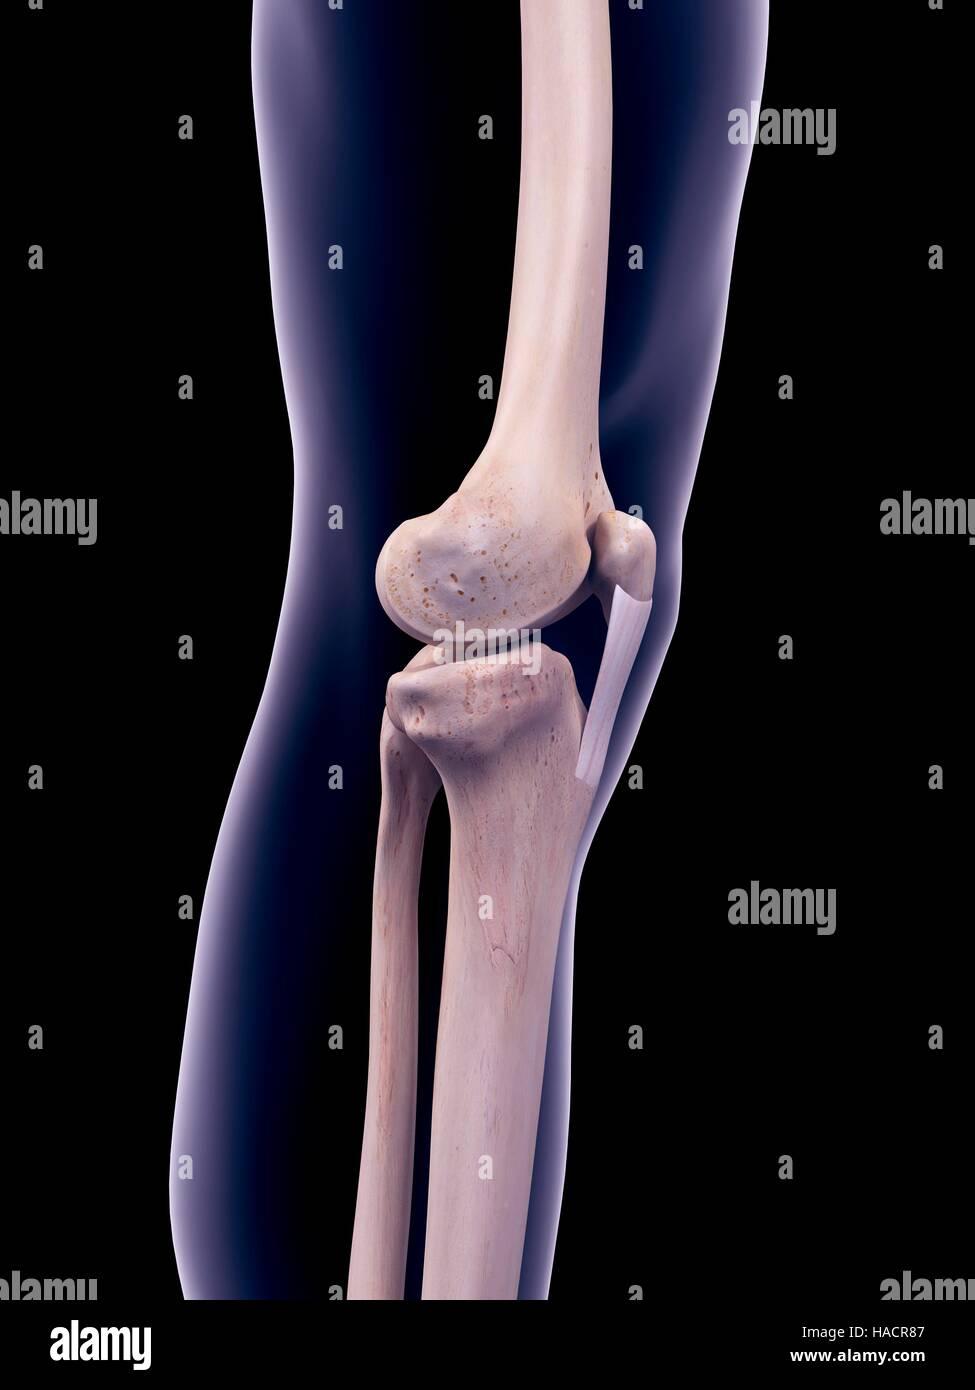 Medial Patellar Ligament Stock Photos Medial Patellar Ligament